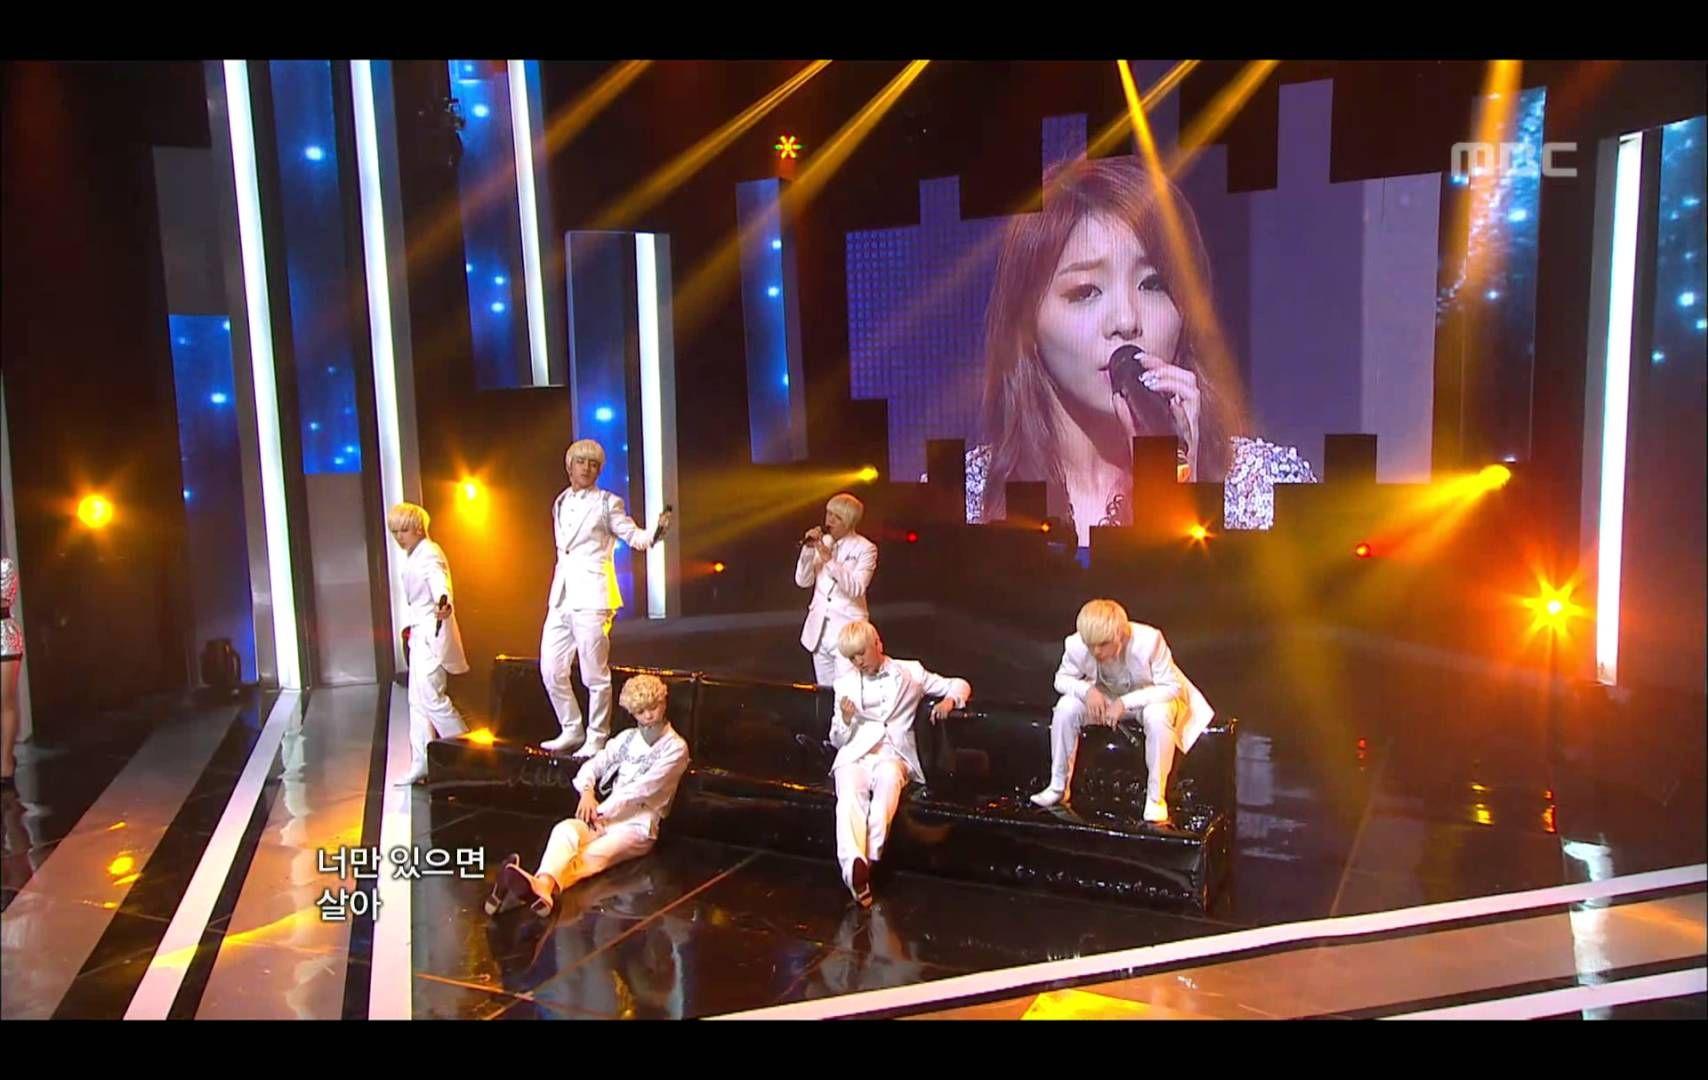 B.A.P - Secret love(feat.Ailee), 비에이피 - 비밀연애(feat.에일리), Music Core 20120310